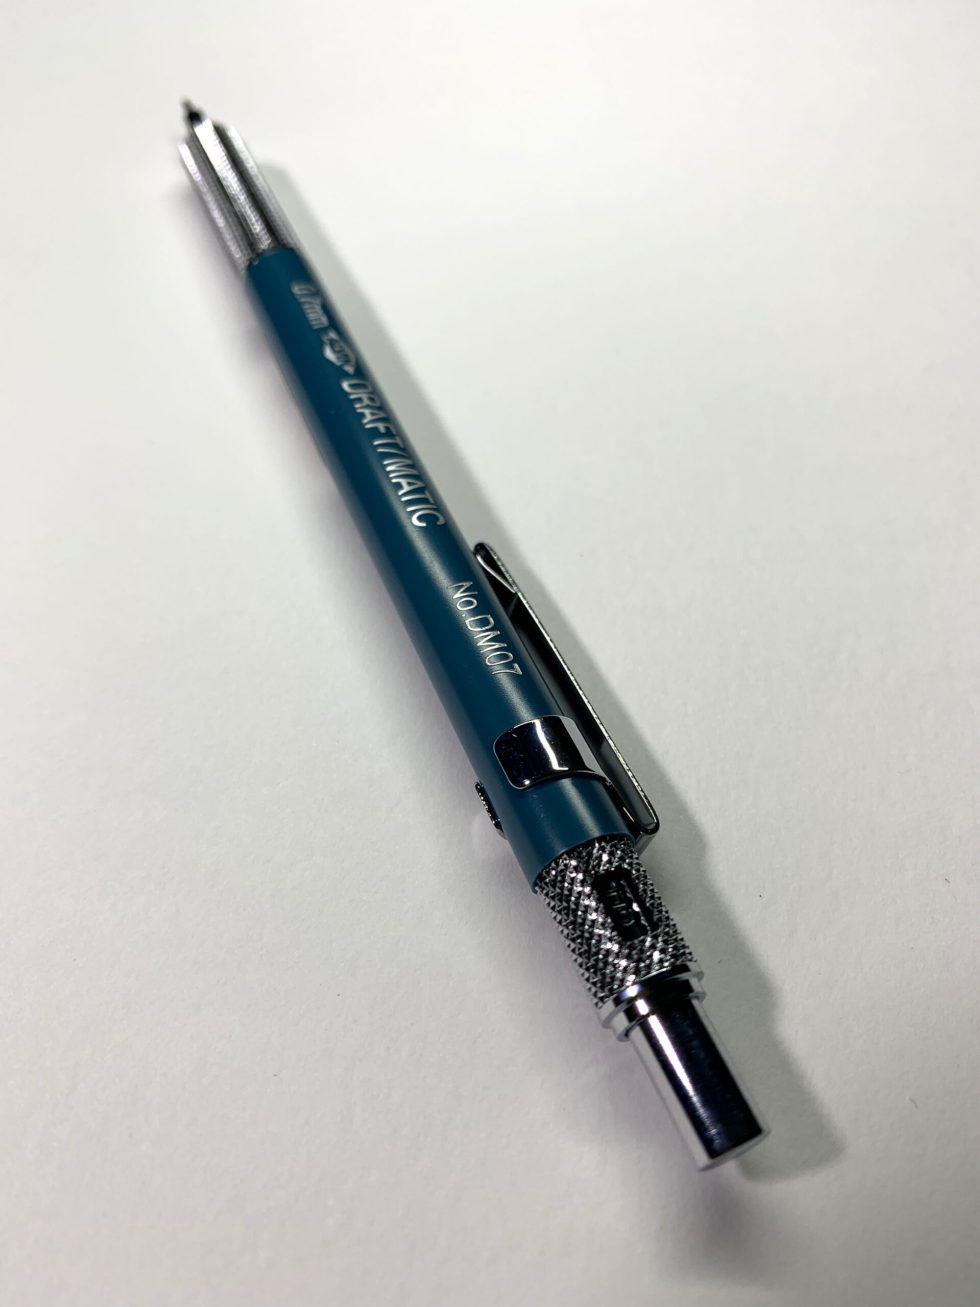 Alvin Draft/Matic .7mm Pencil Image 2